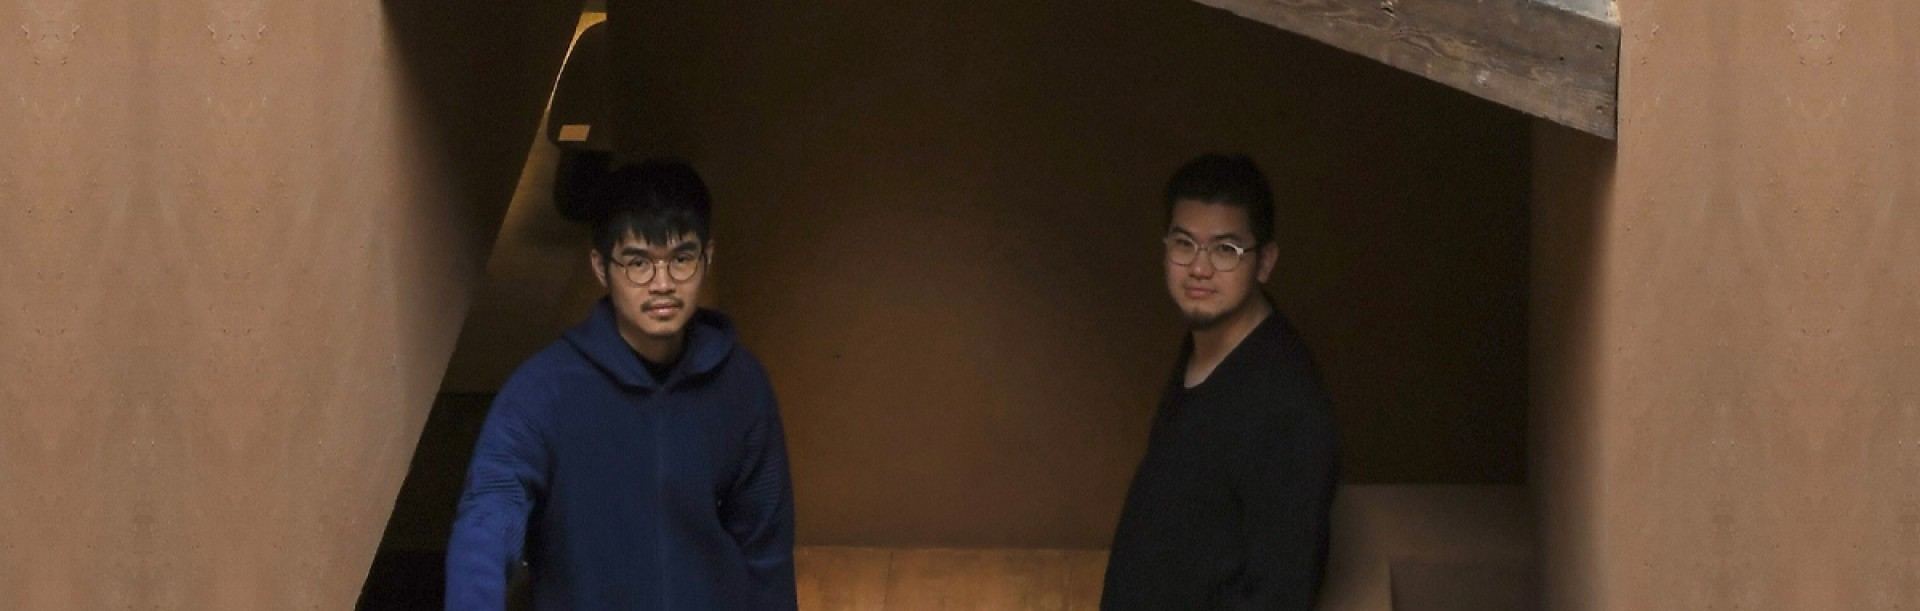 Youngi | 独家专访福州 x 东形西见